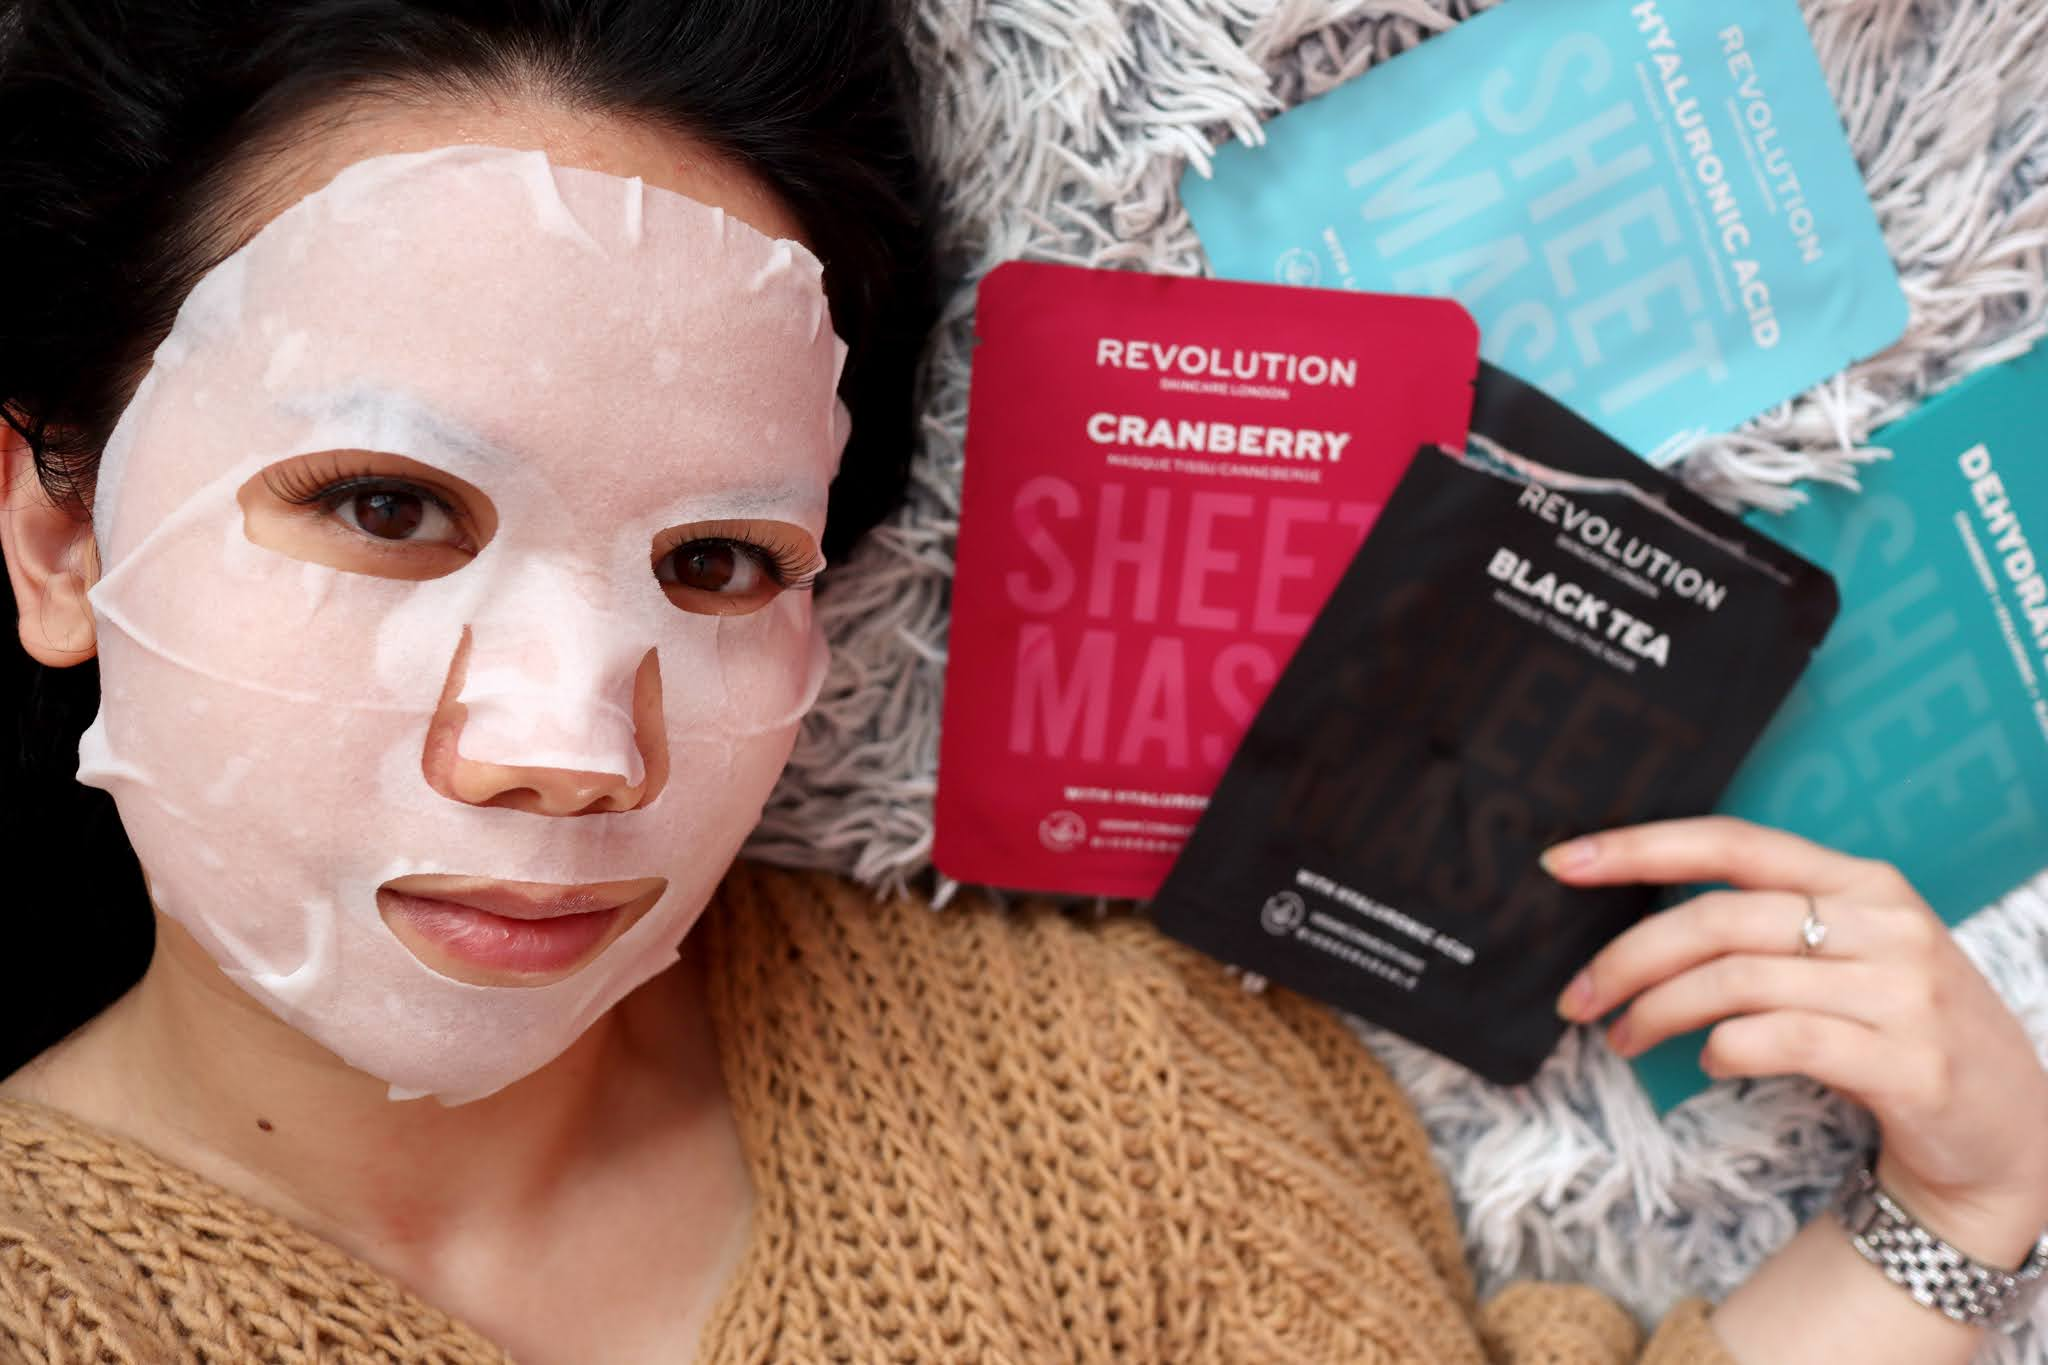 Revolution Skincare Sheet masks